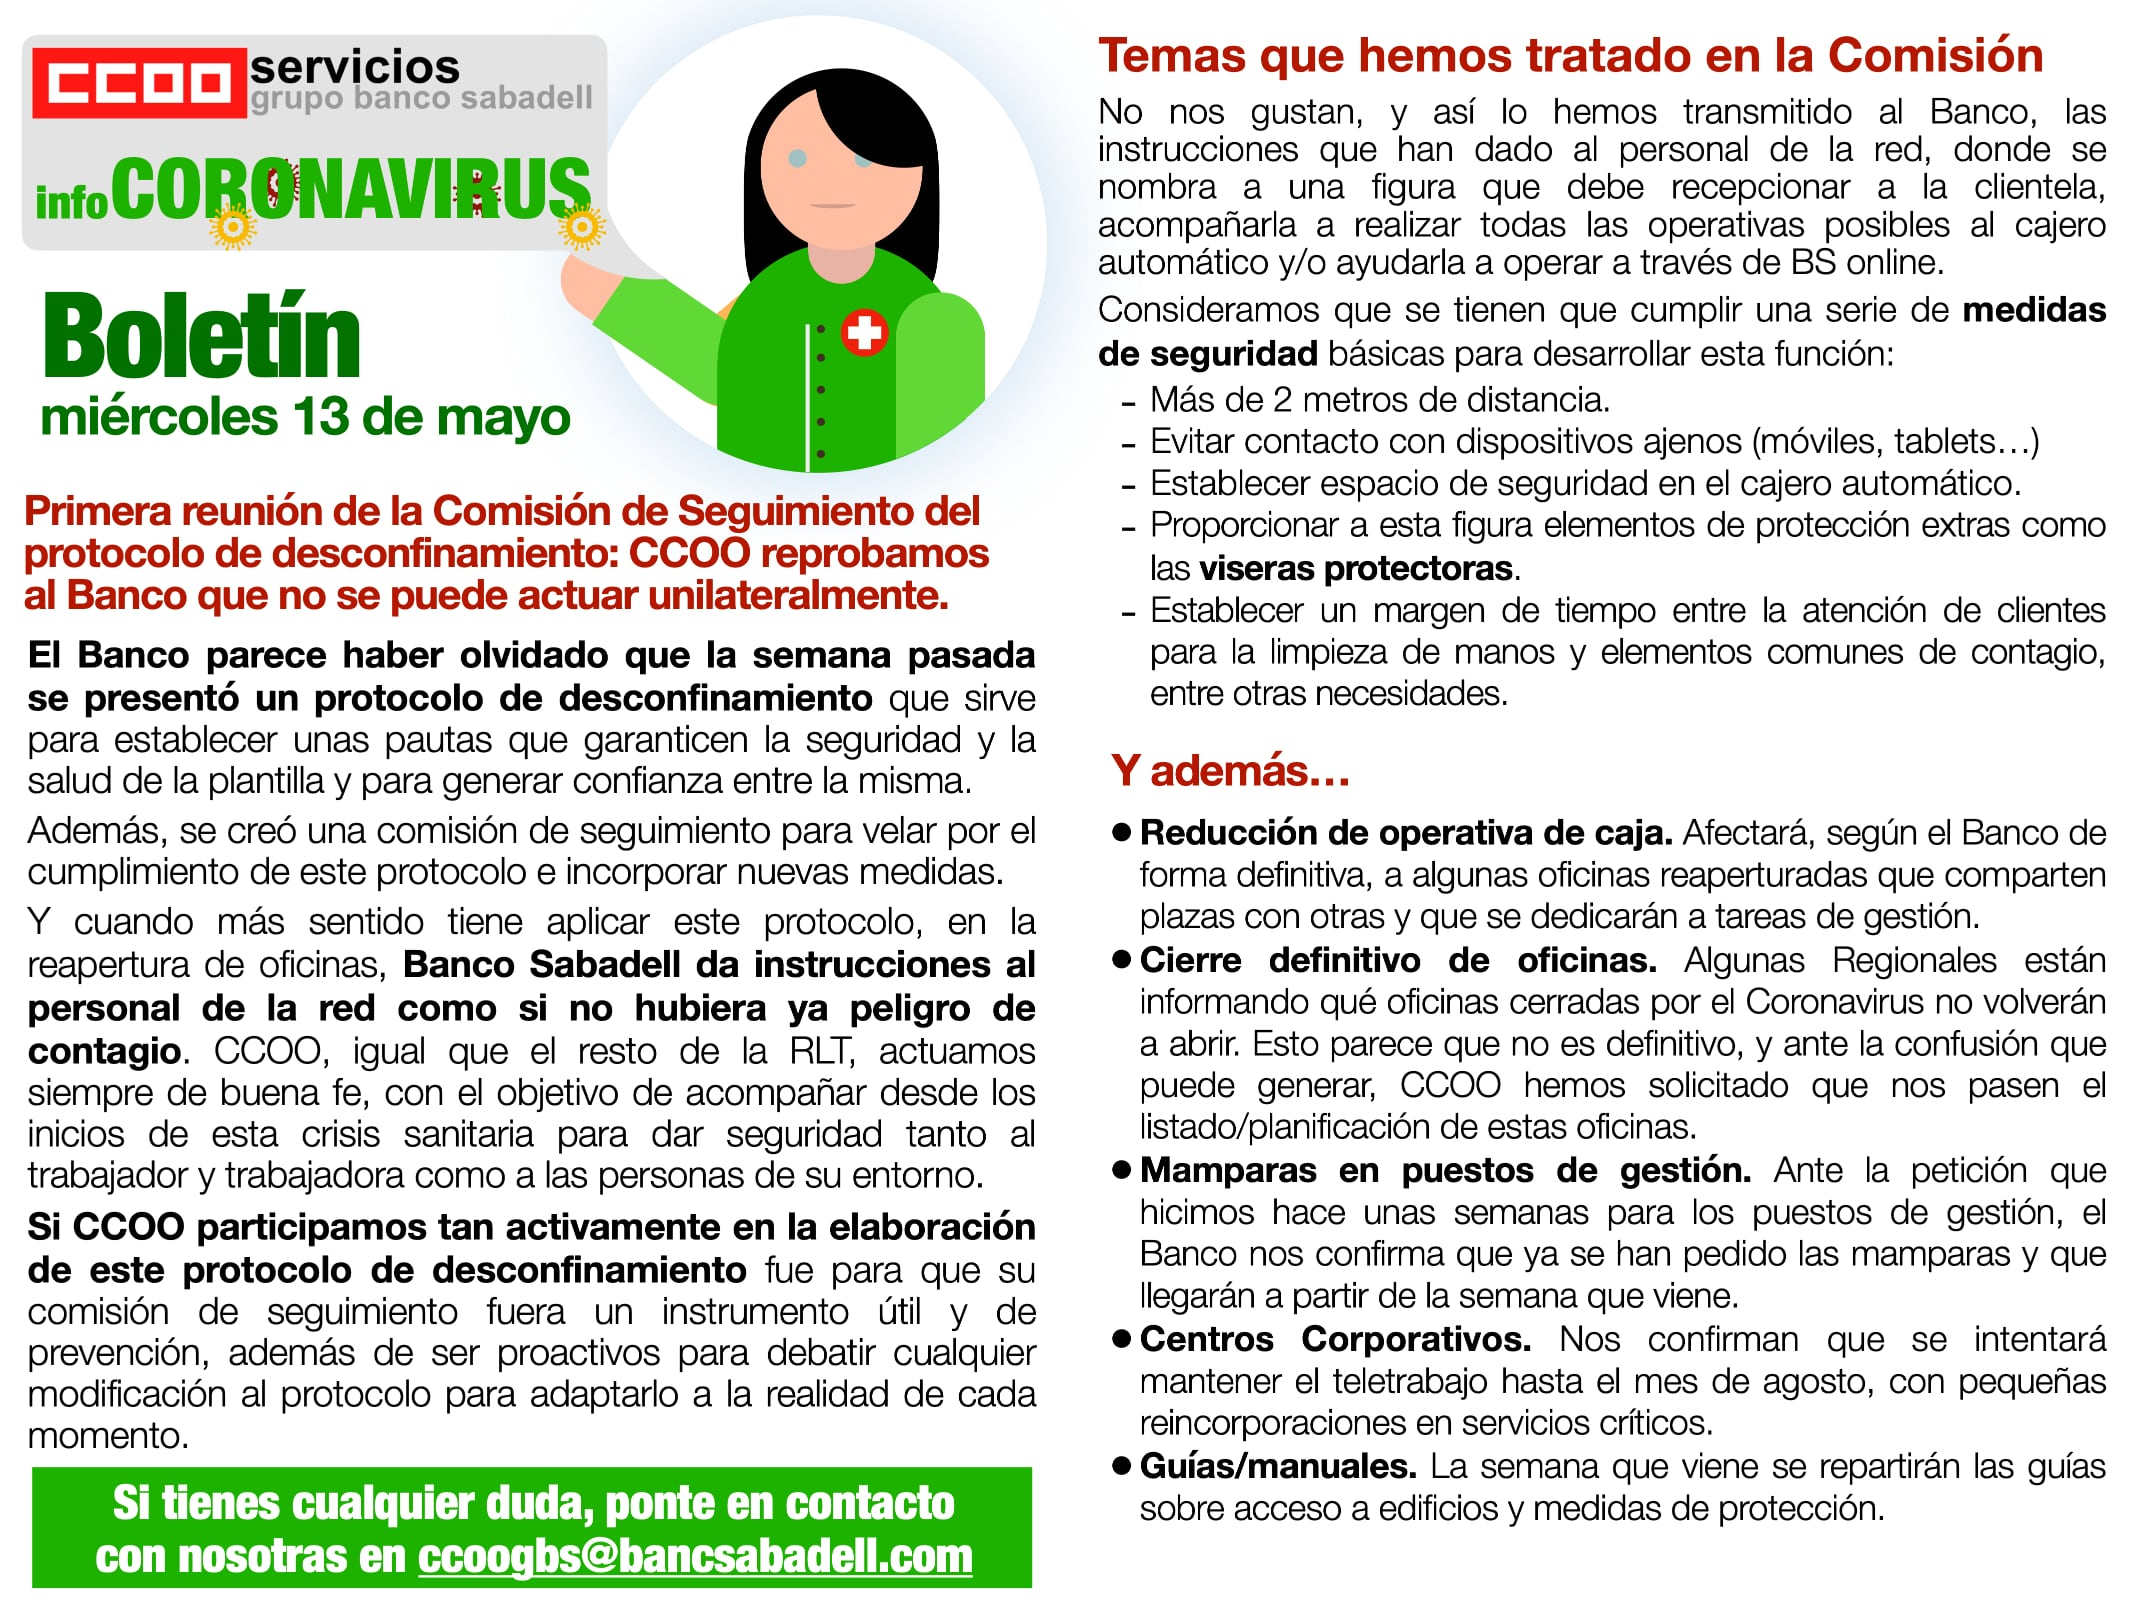 Boletin COVID 19 Banc Sabadell segunda parte